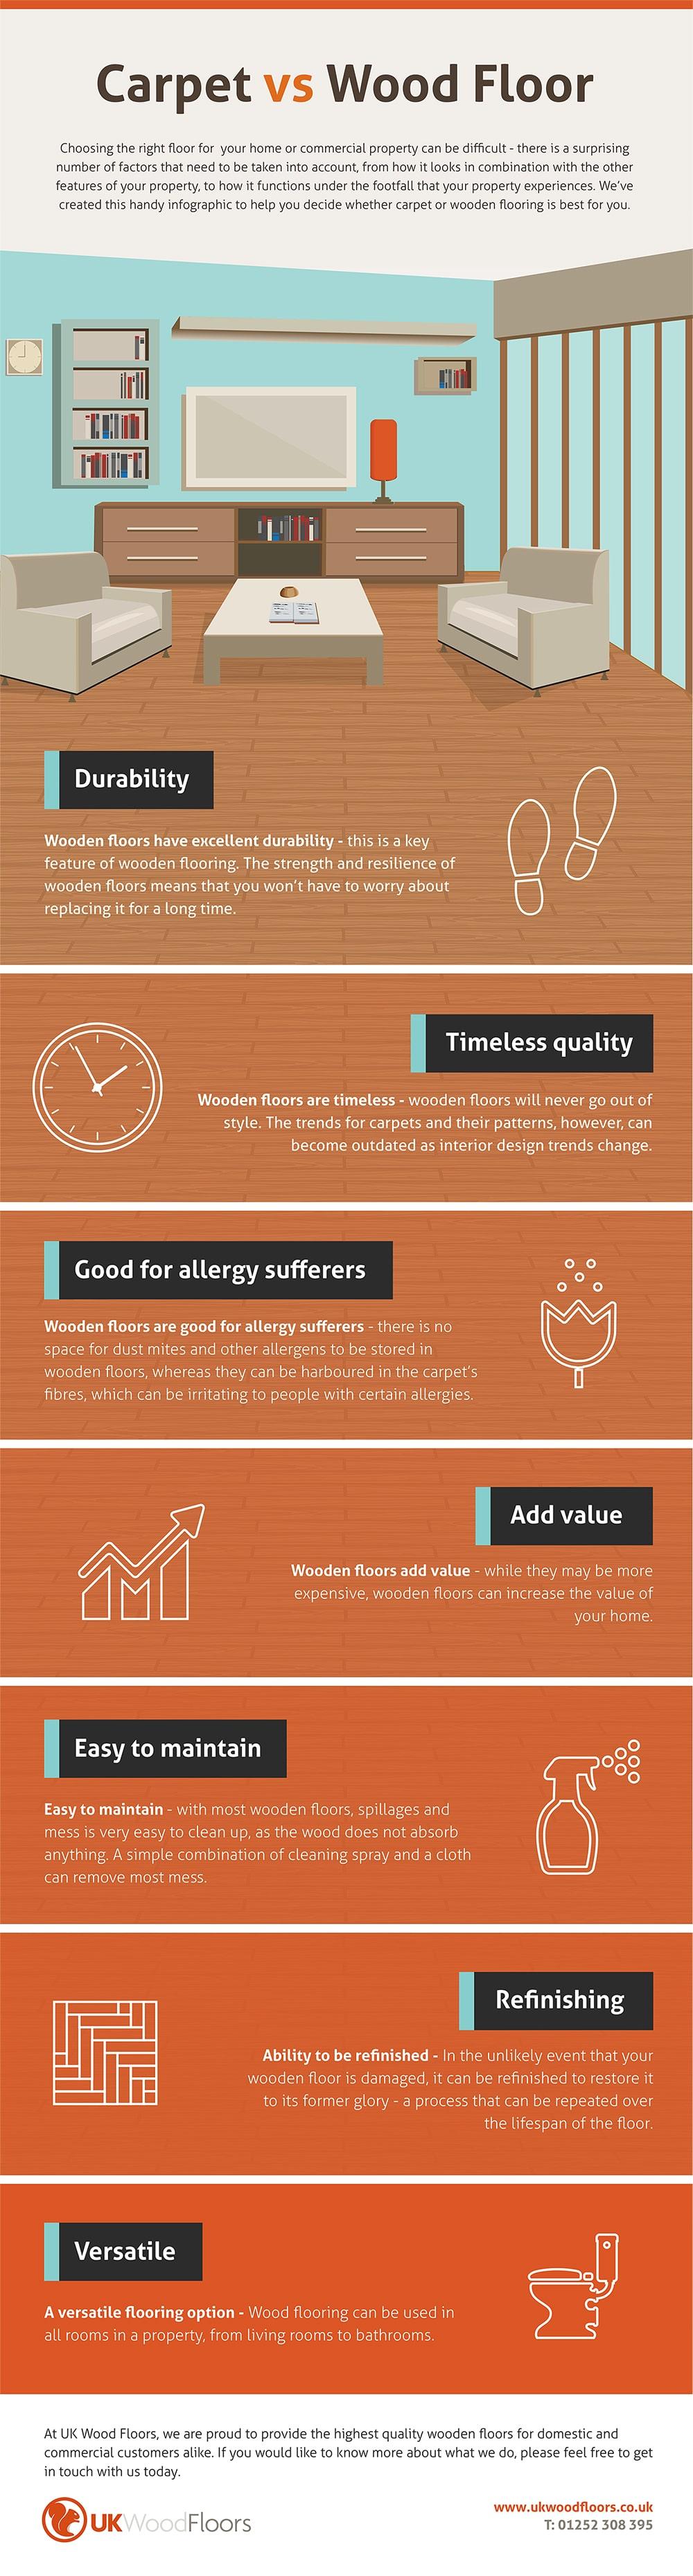 Carpet vs Wood Floors – Infographic!